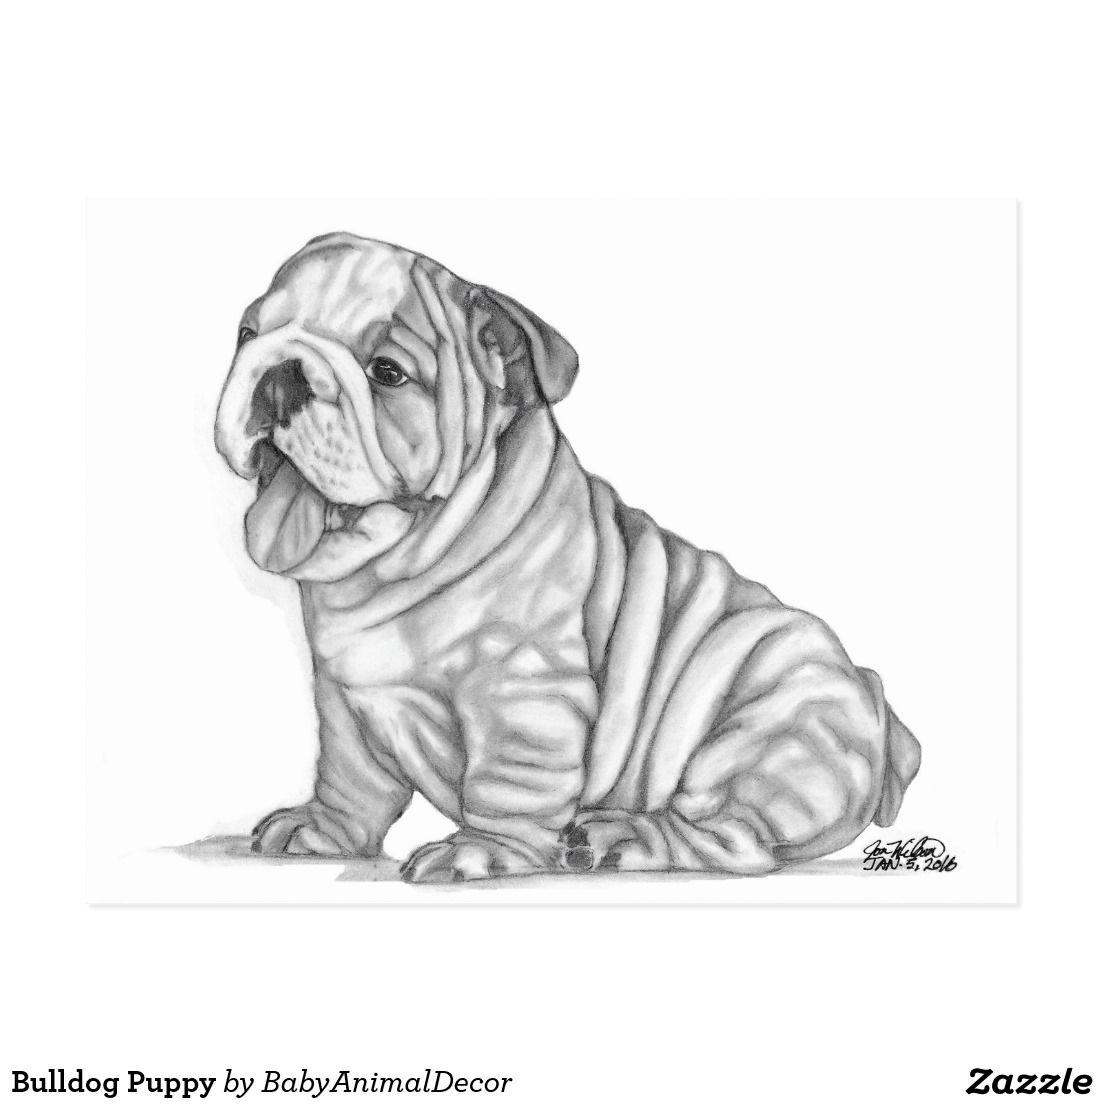 Bulldog Puppy Bulldog Puppies Puppies Bulldog